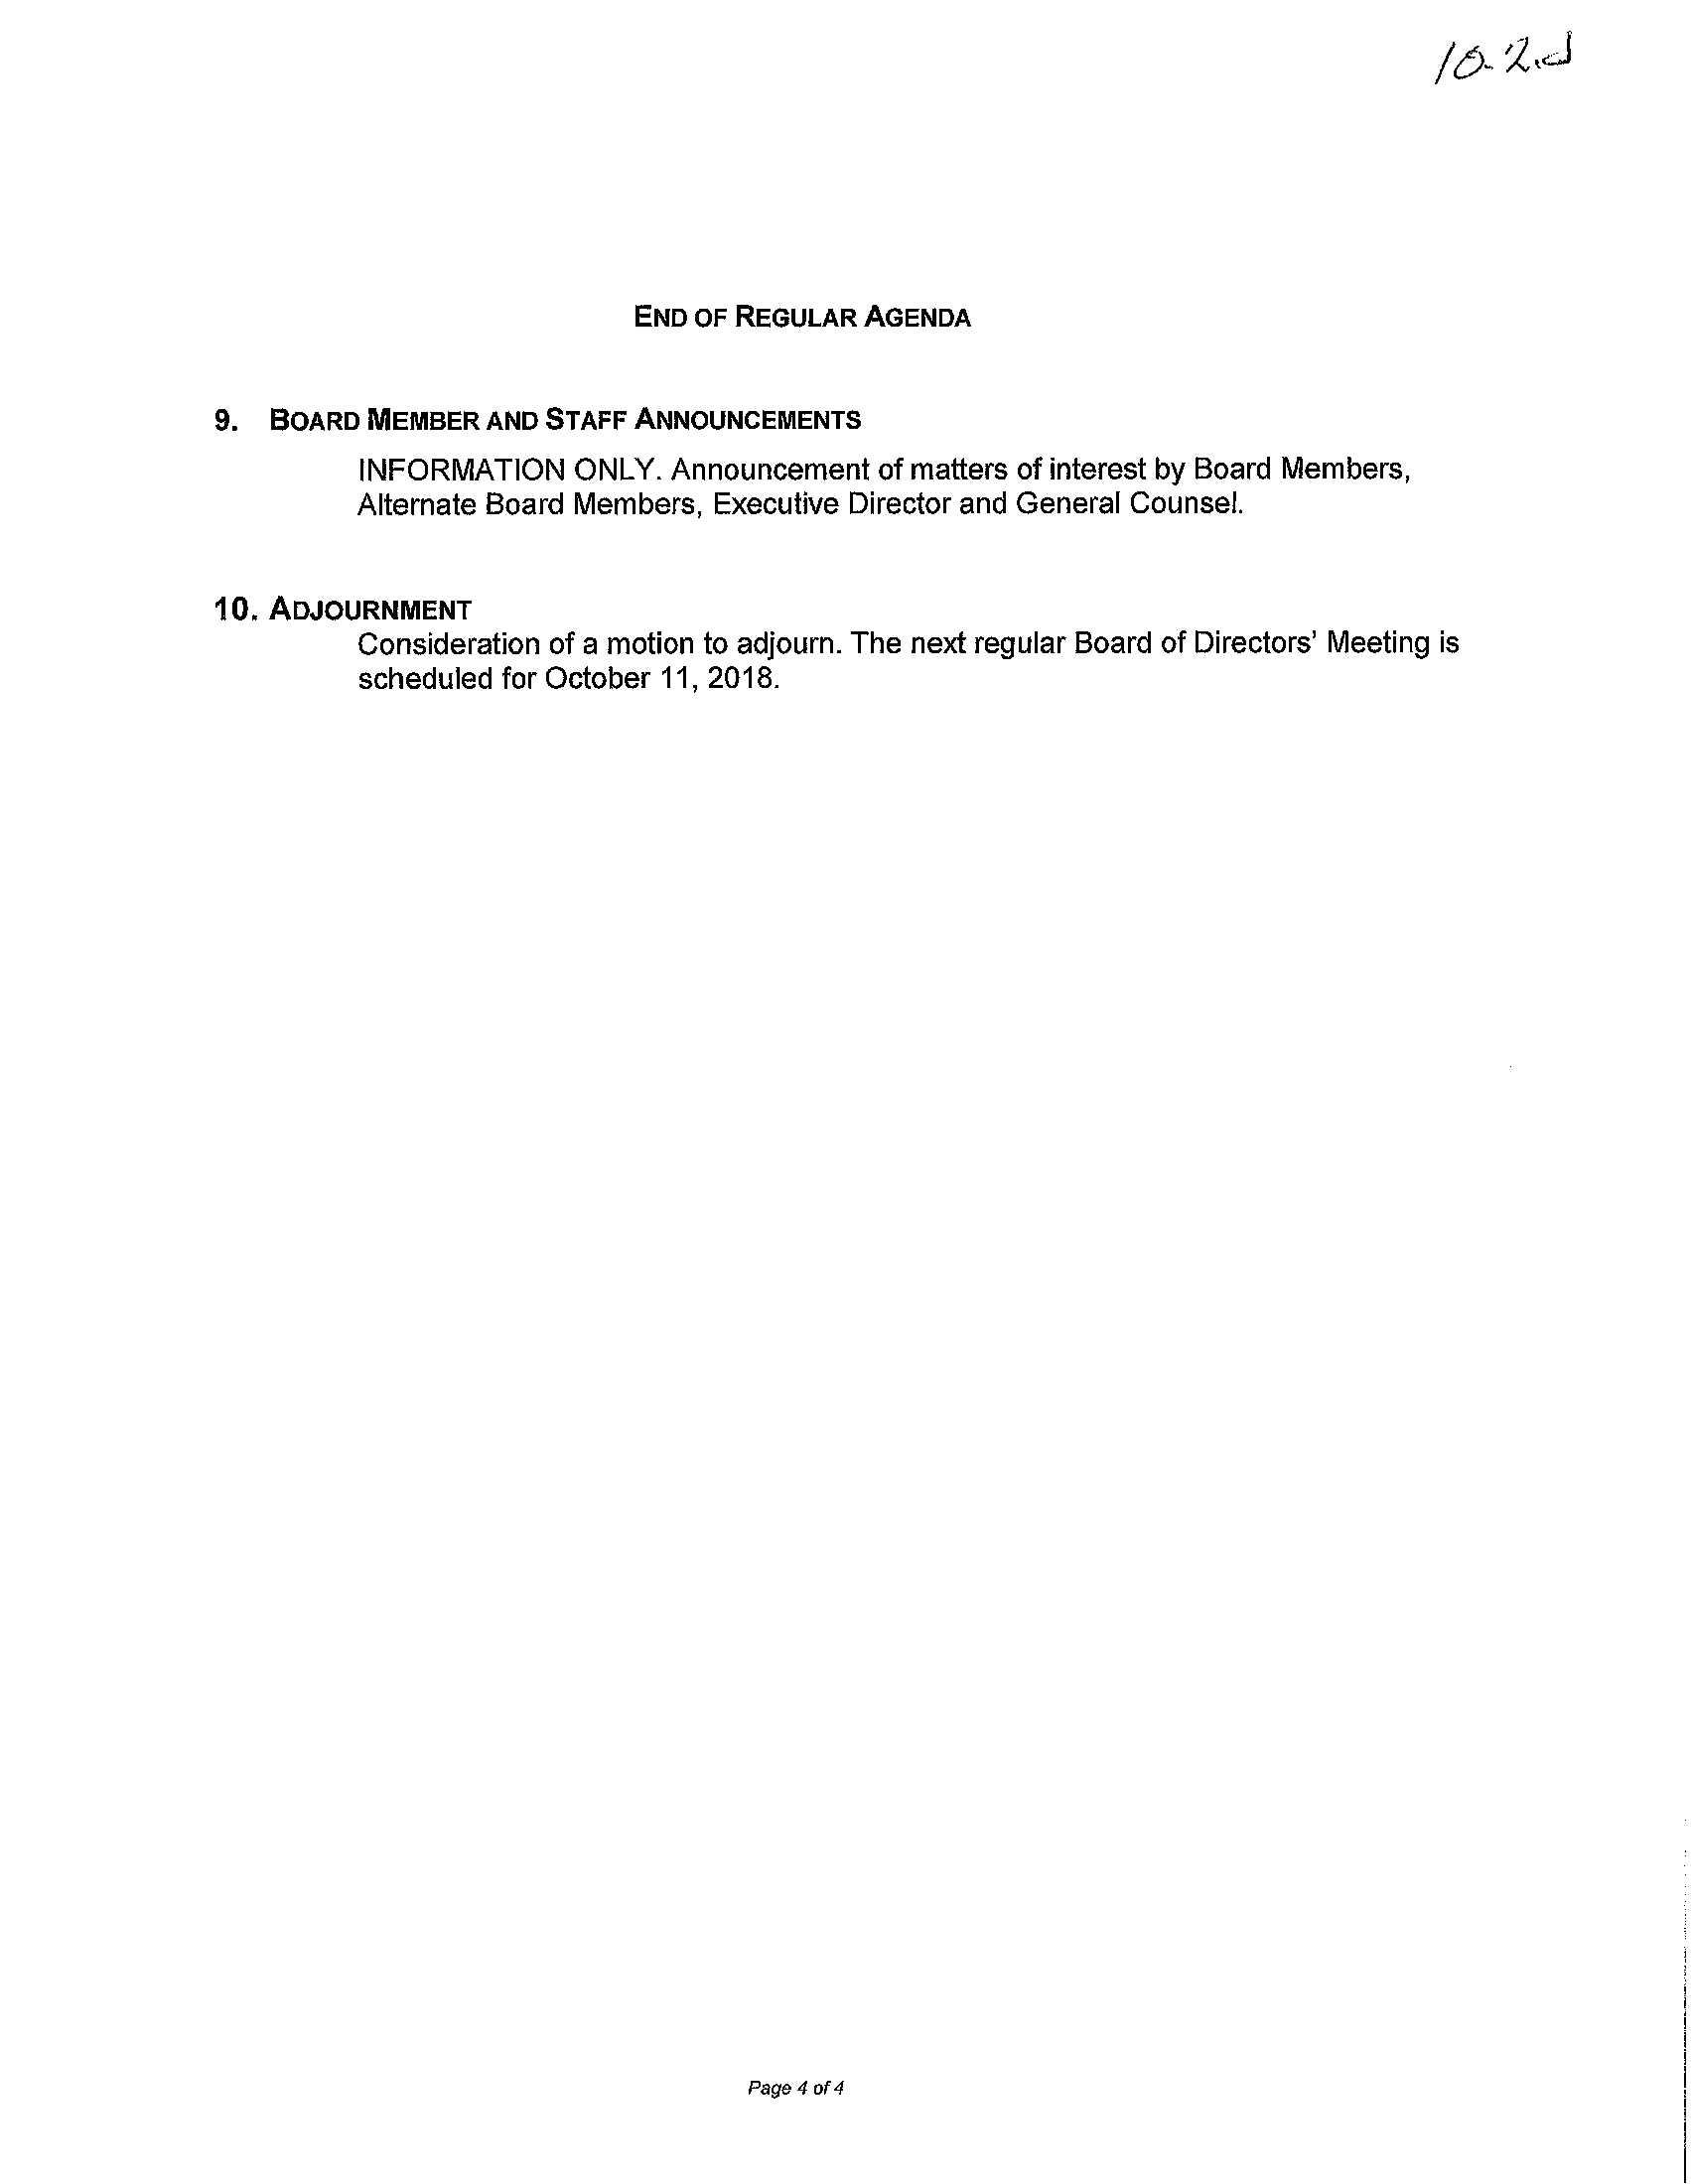 ESMAC Agenda 10.10.2018 (32 Pages)_20.jpg